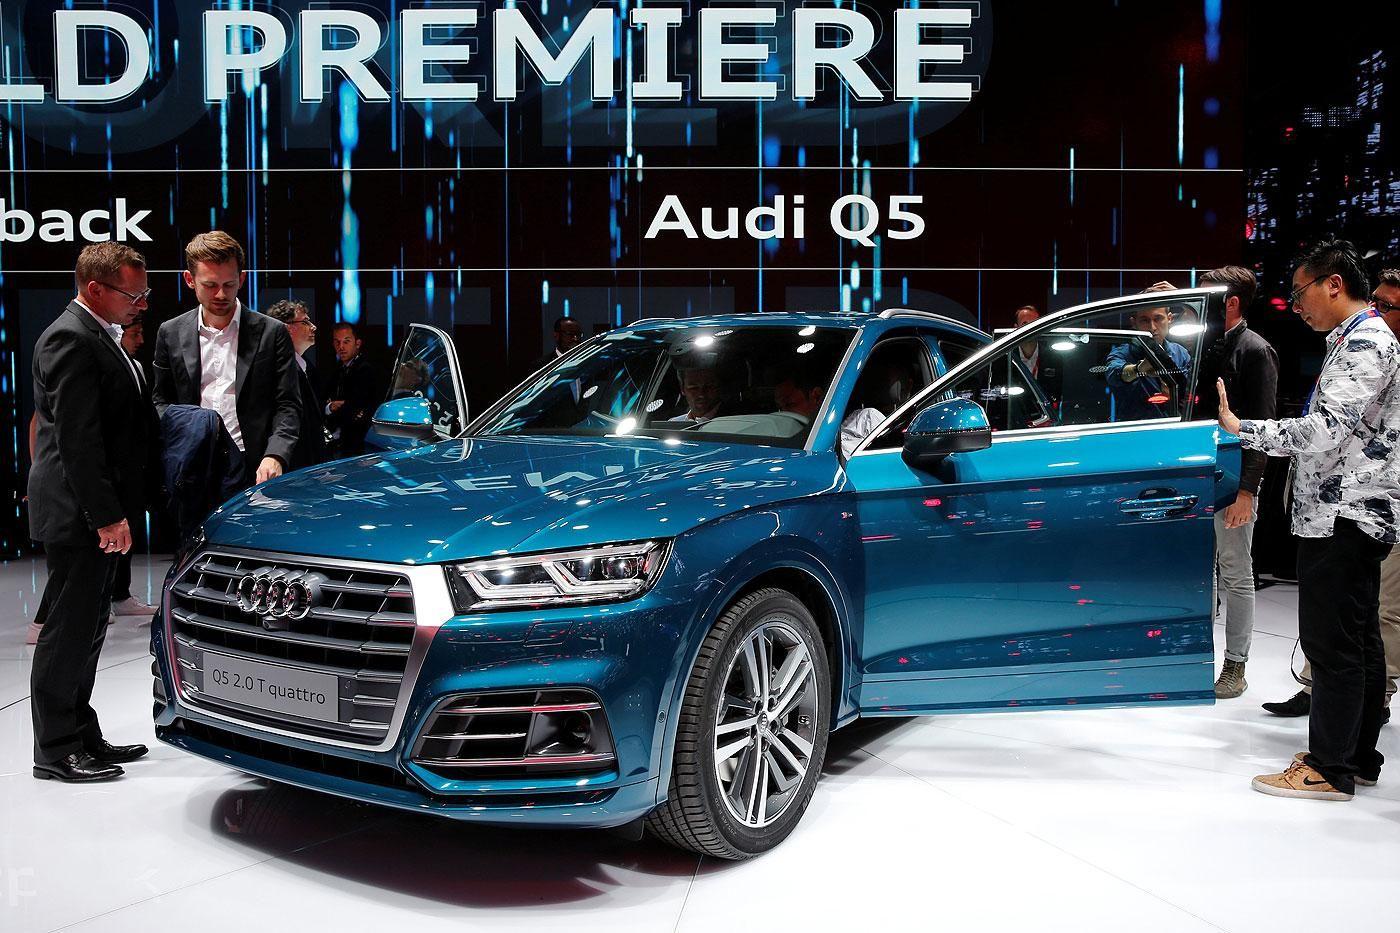 Audi Q5 gains size, power | https://goo.gl/2pBdgb